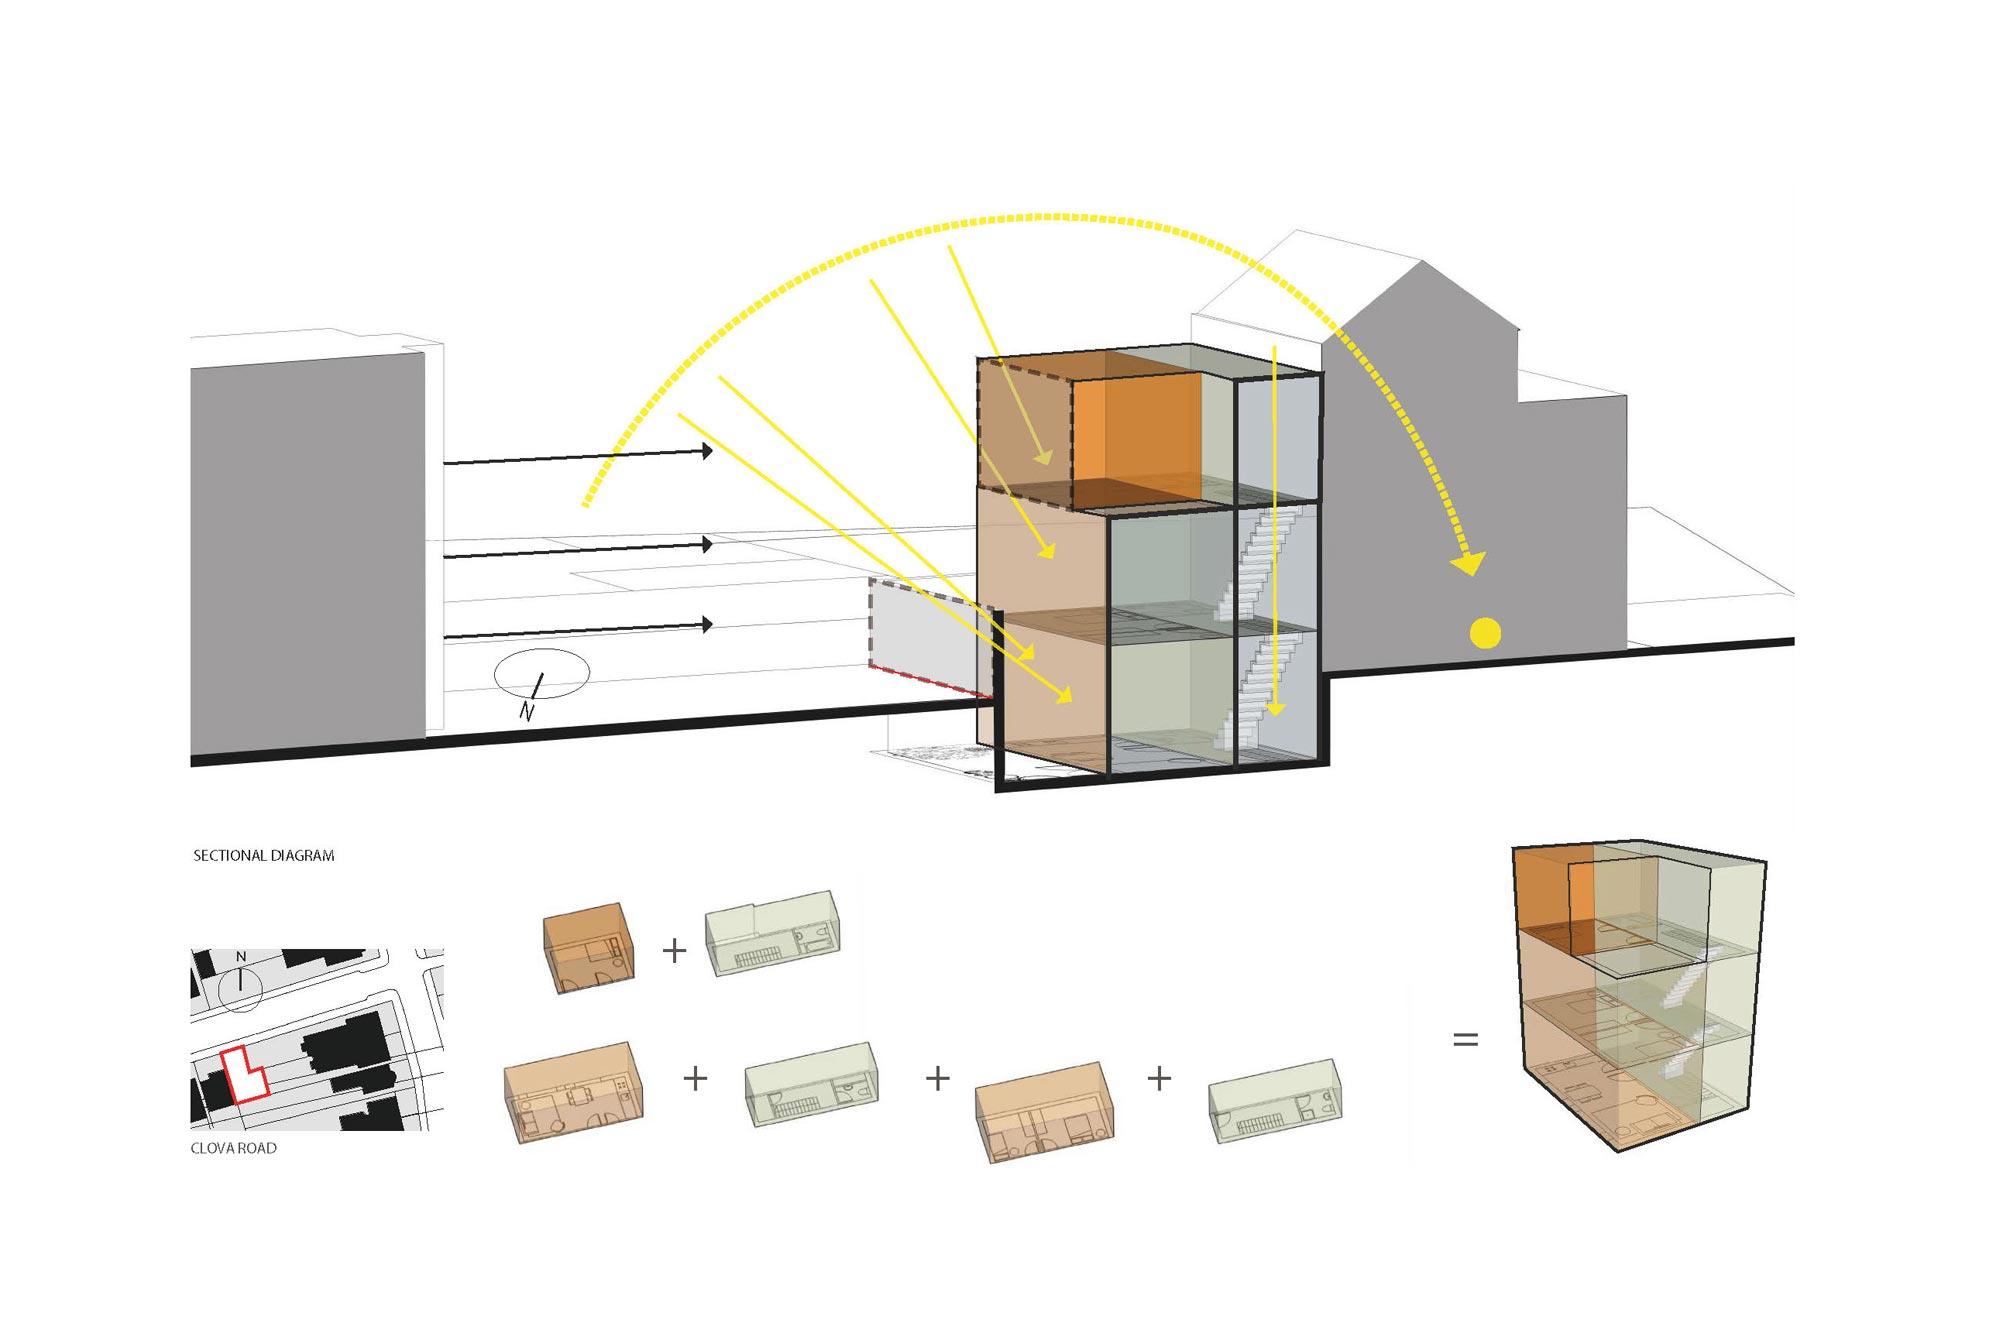 cube-haus-adjaye-associates-architects-cs-2000px-08